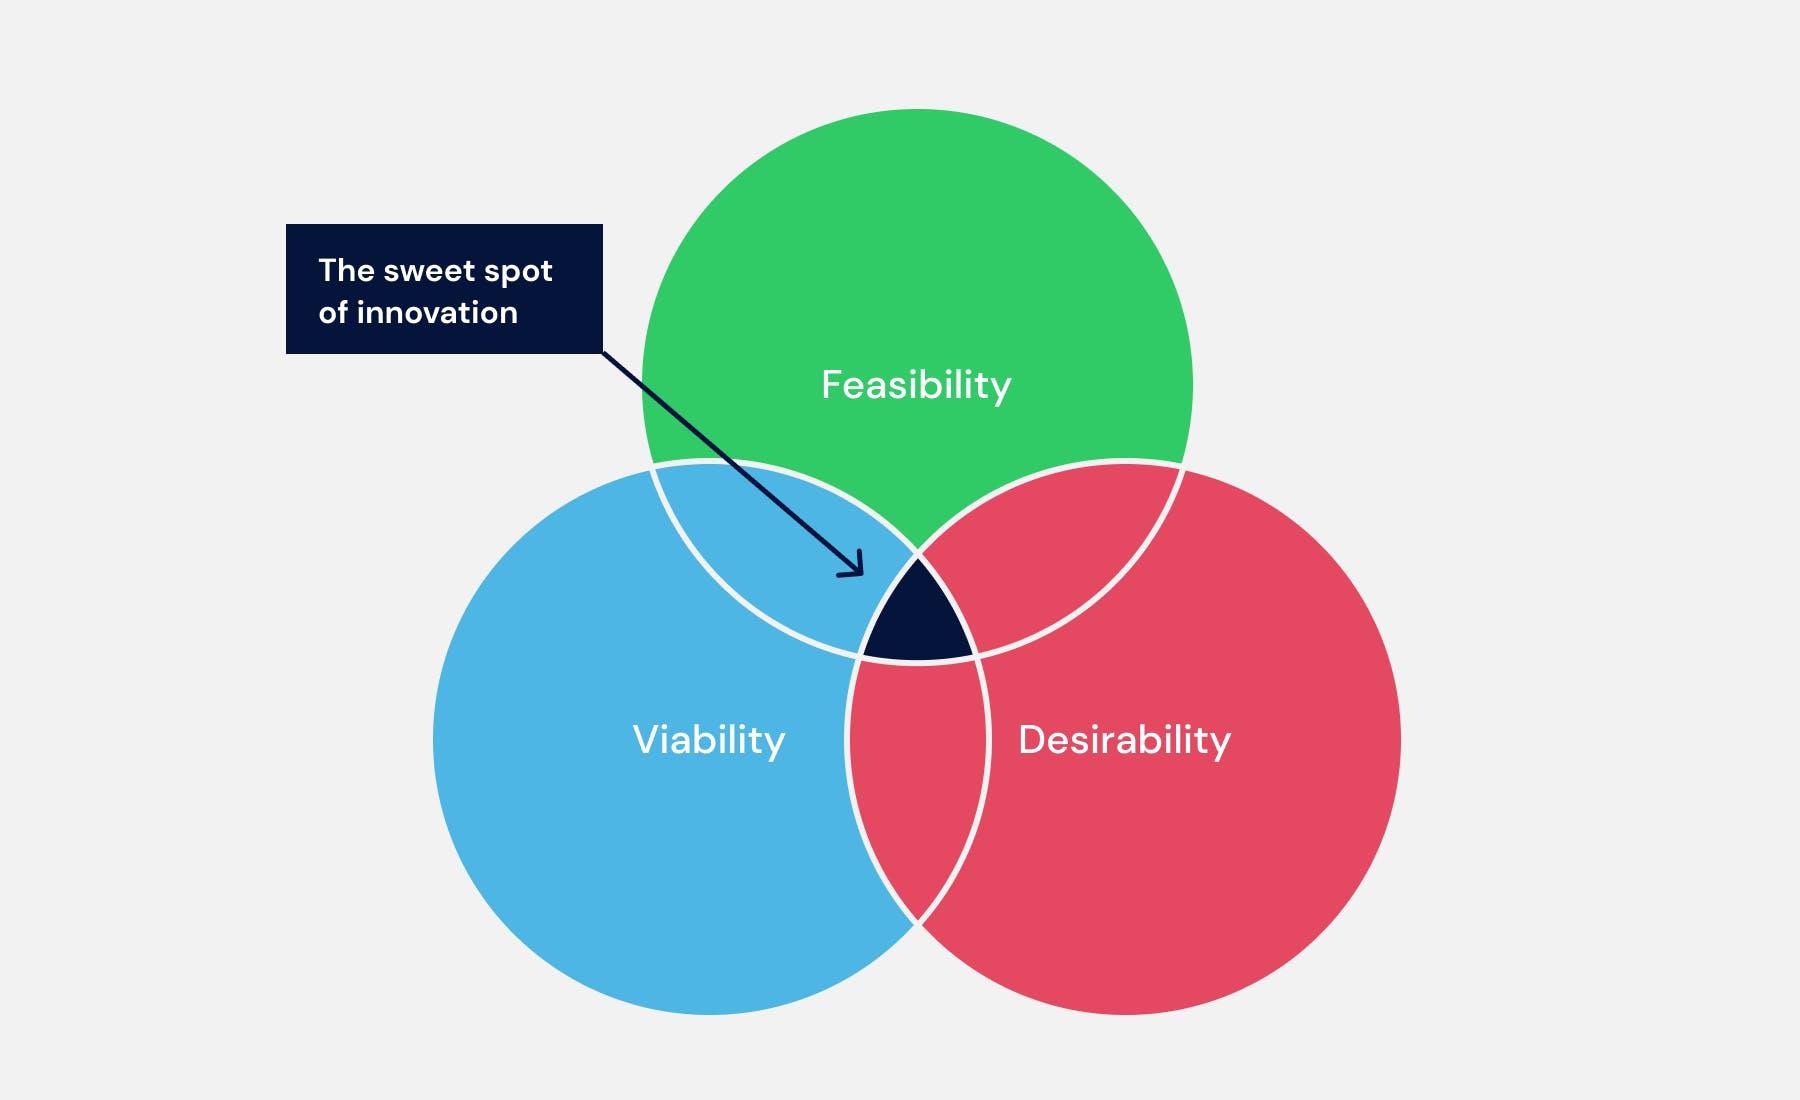 Produktentwicklung: Testing business ideas mit dem Sweet Spot of Innovation